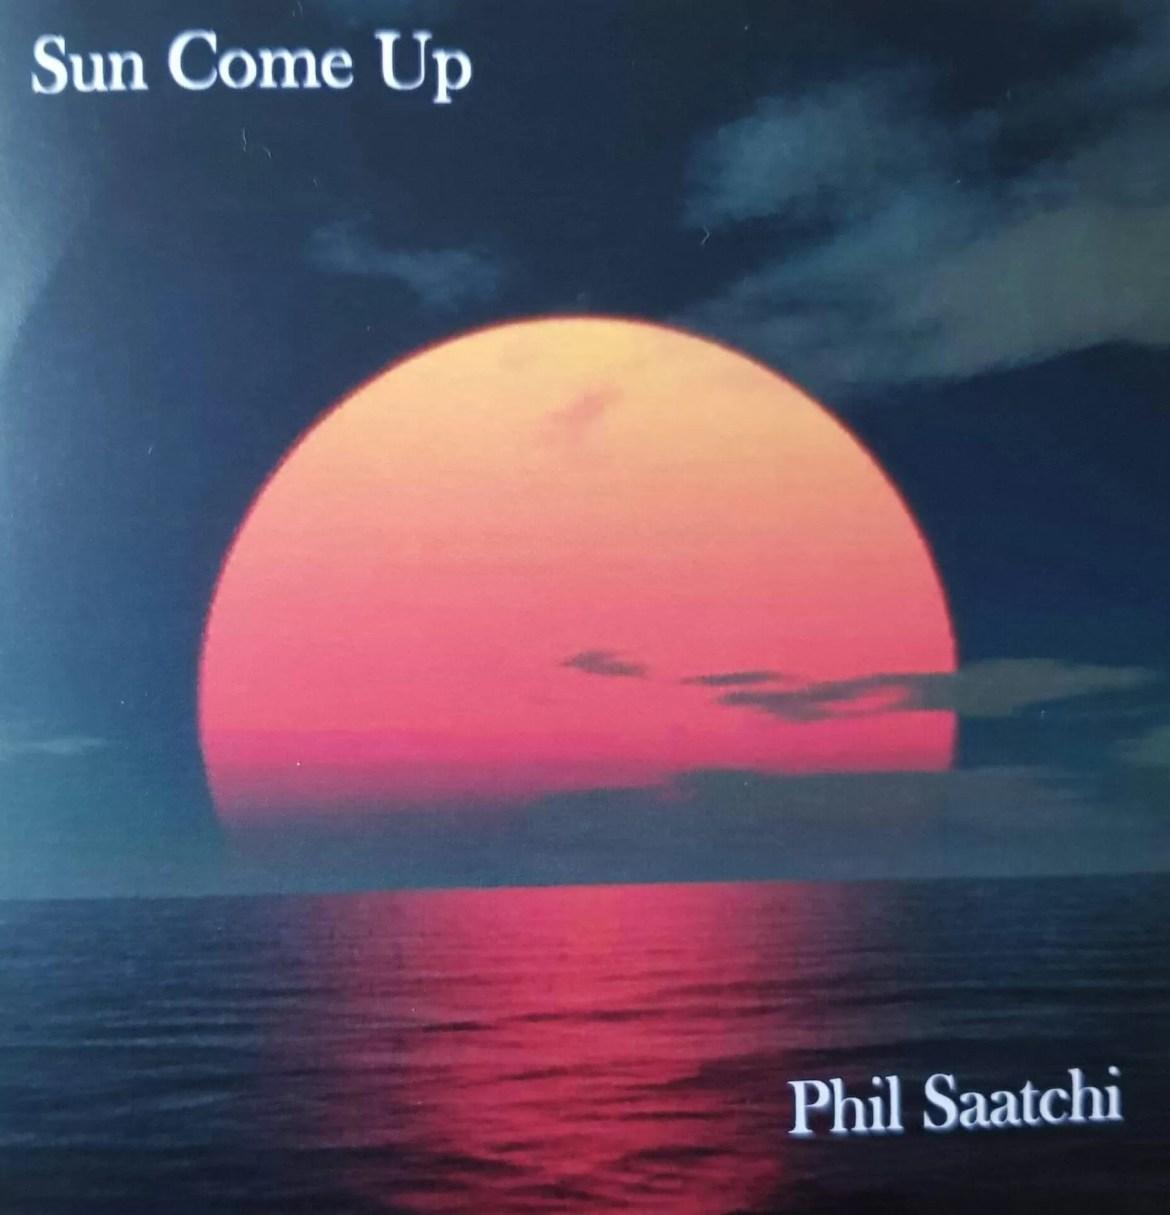 Phil Saatchi – Sun Come Up (www.philsaachi.com)